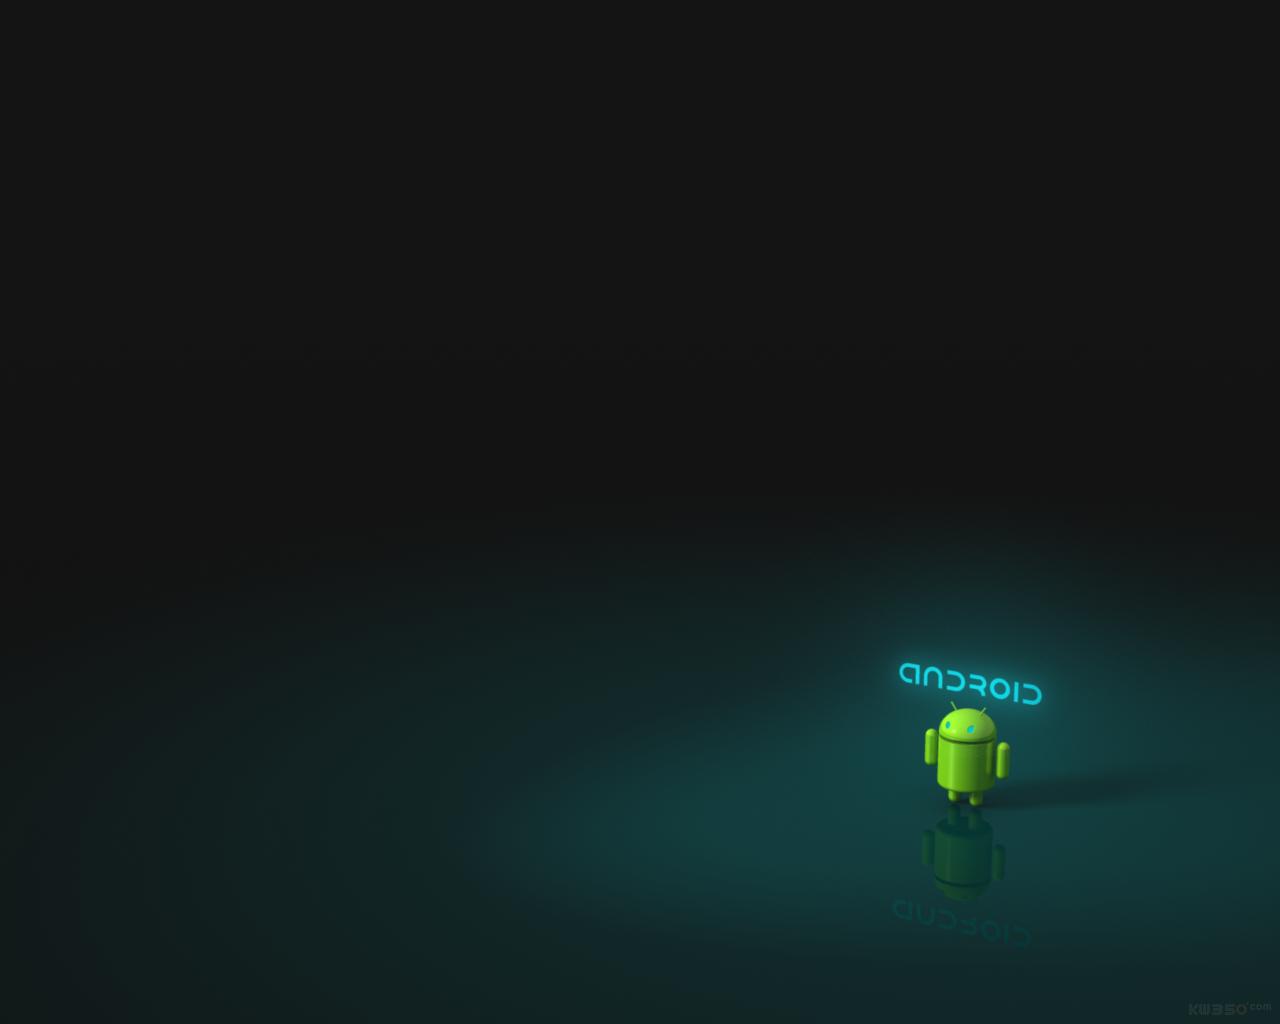 android wallpapers hd android wallpapers hd android wallpapers hd 1280x1024